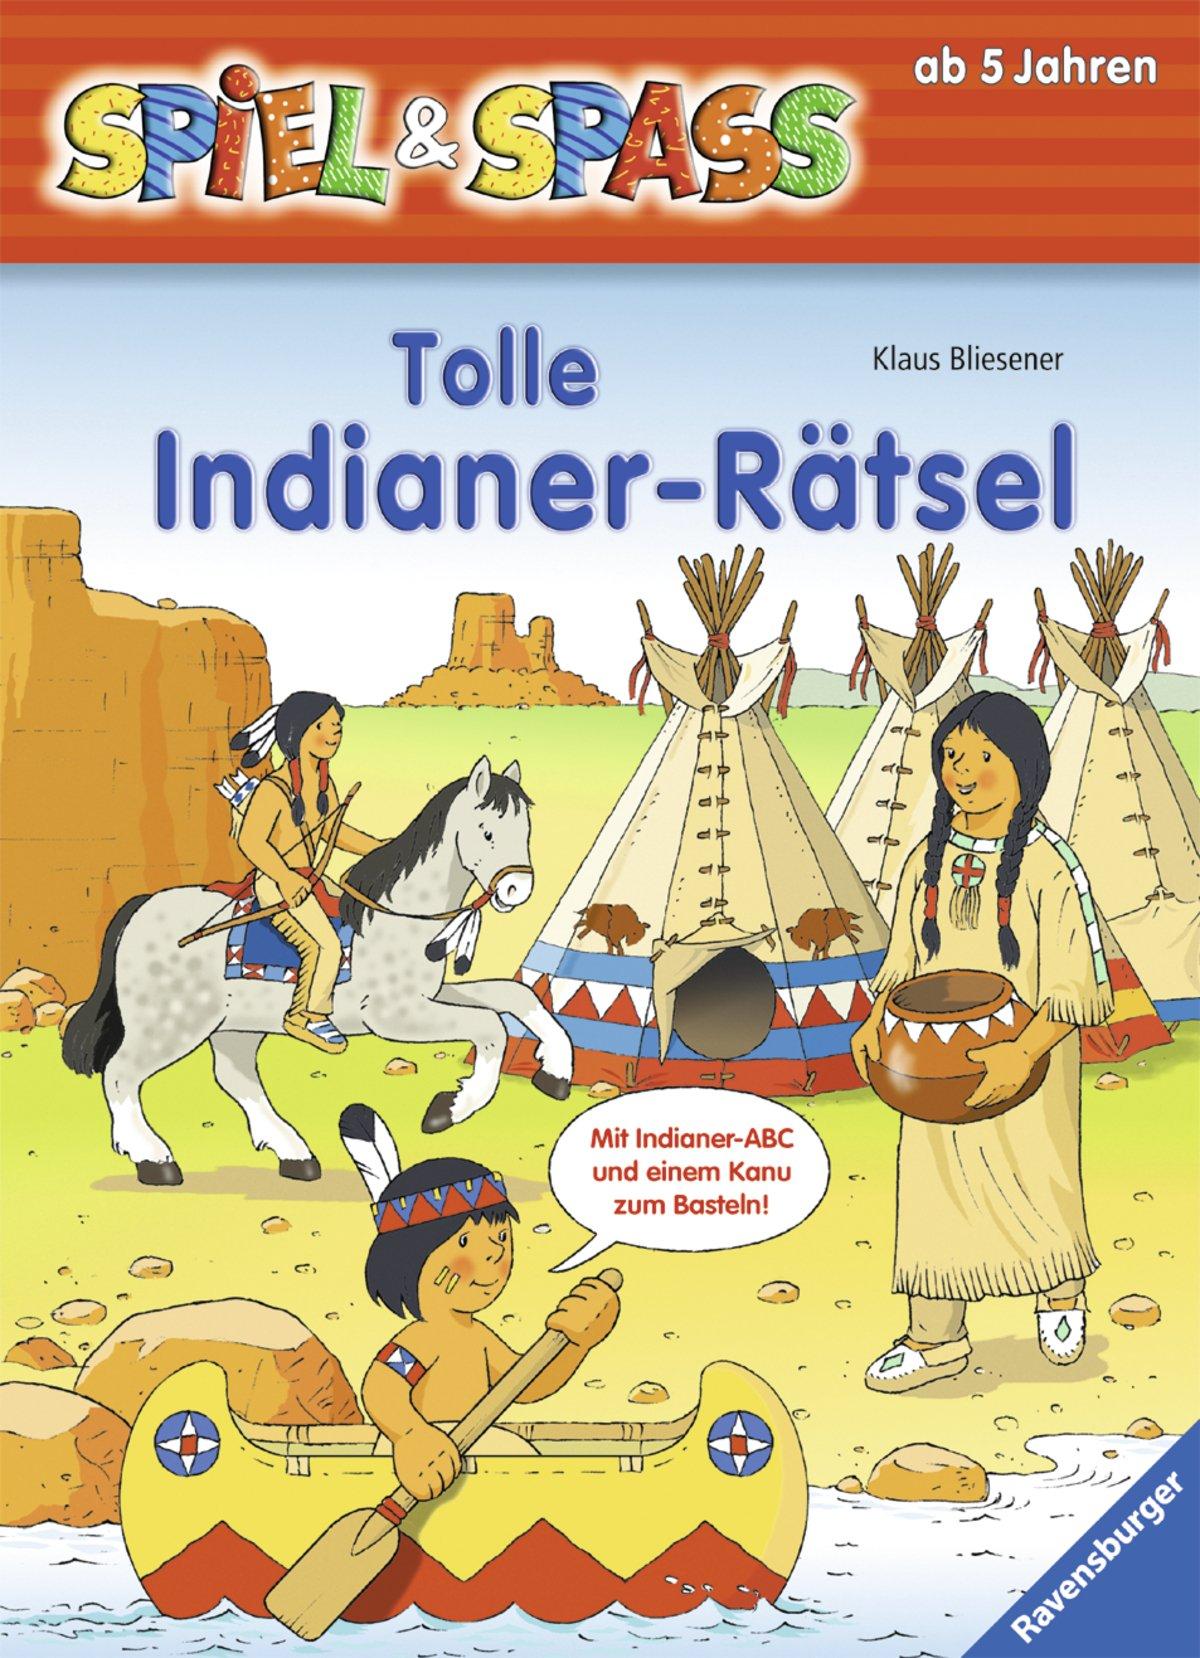 Tolle Indianer-Rätsel (Spiel & Spaß)